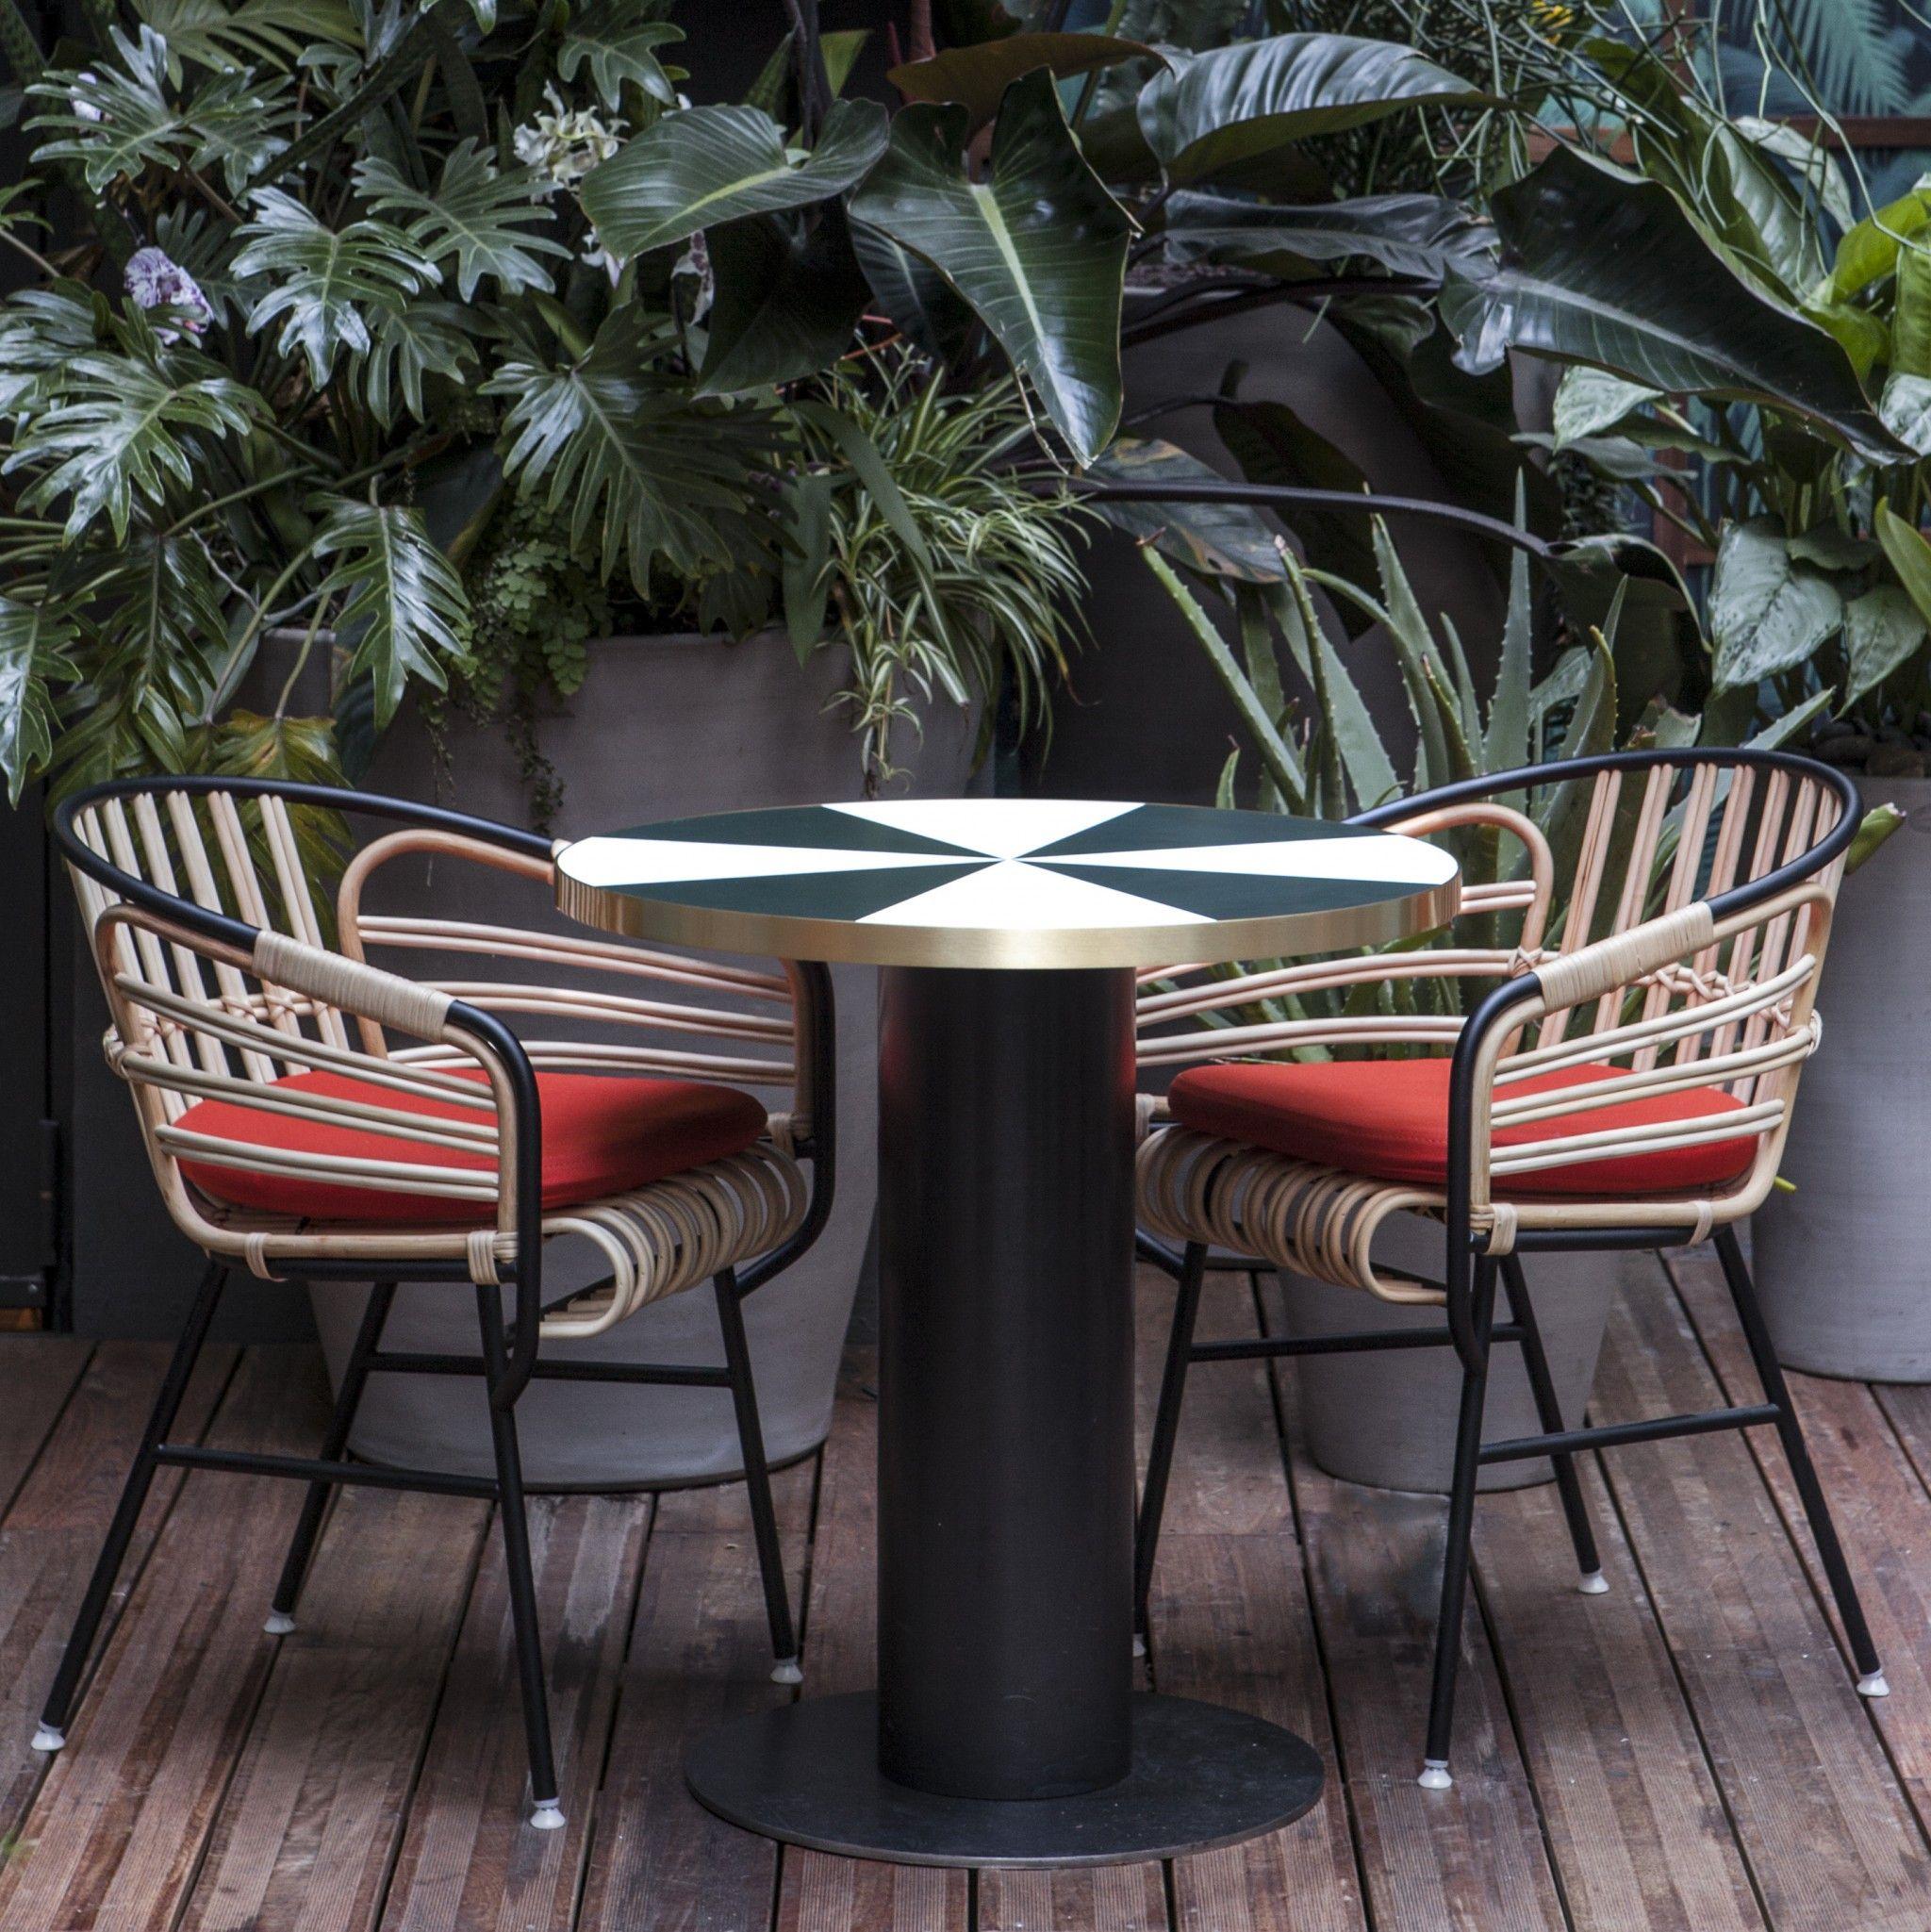 le sinople restaurant paris Buscar con Google